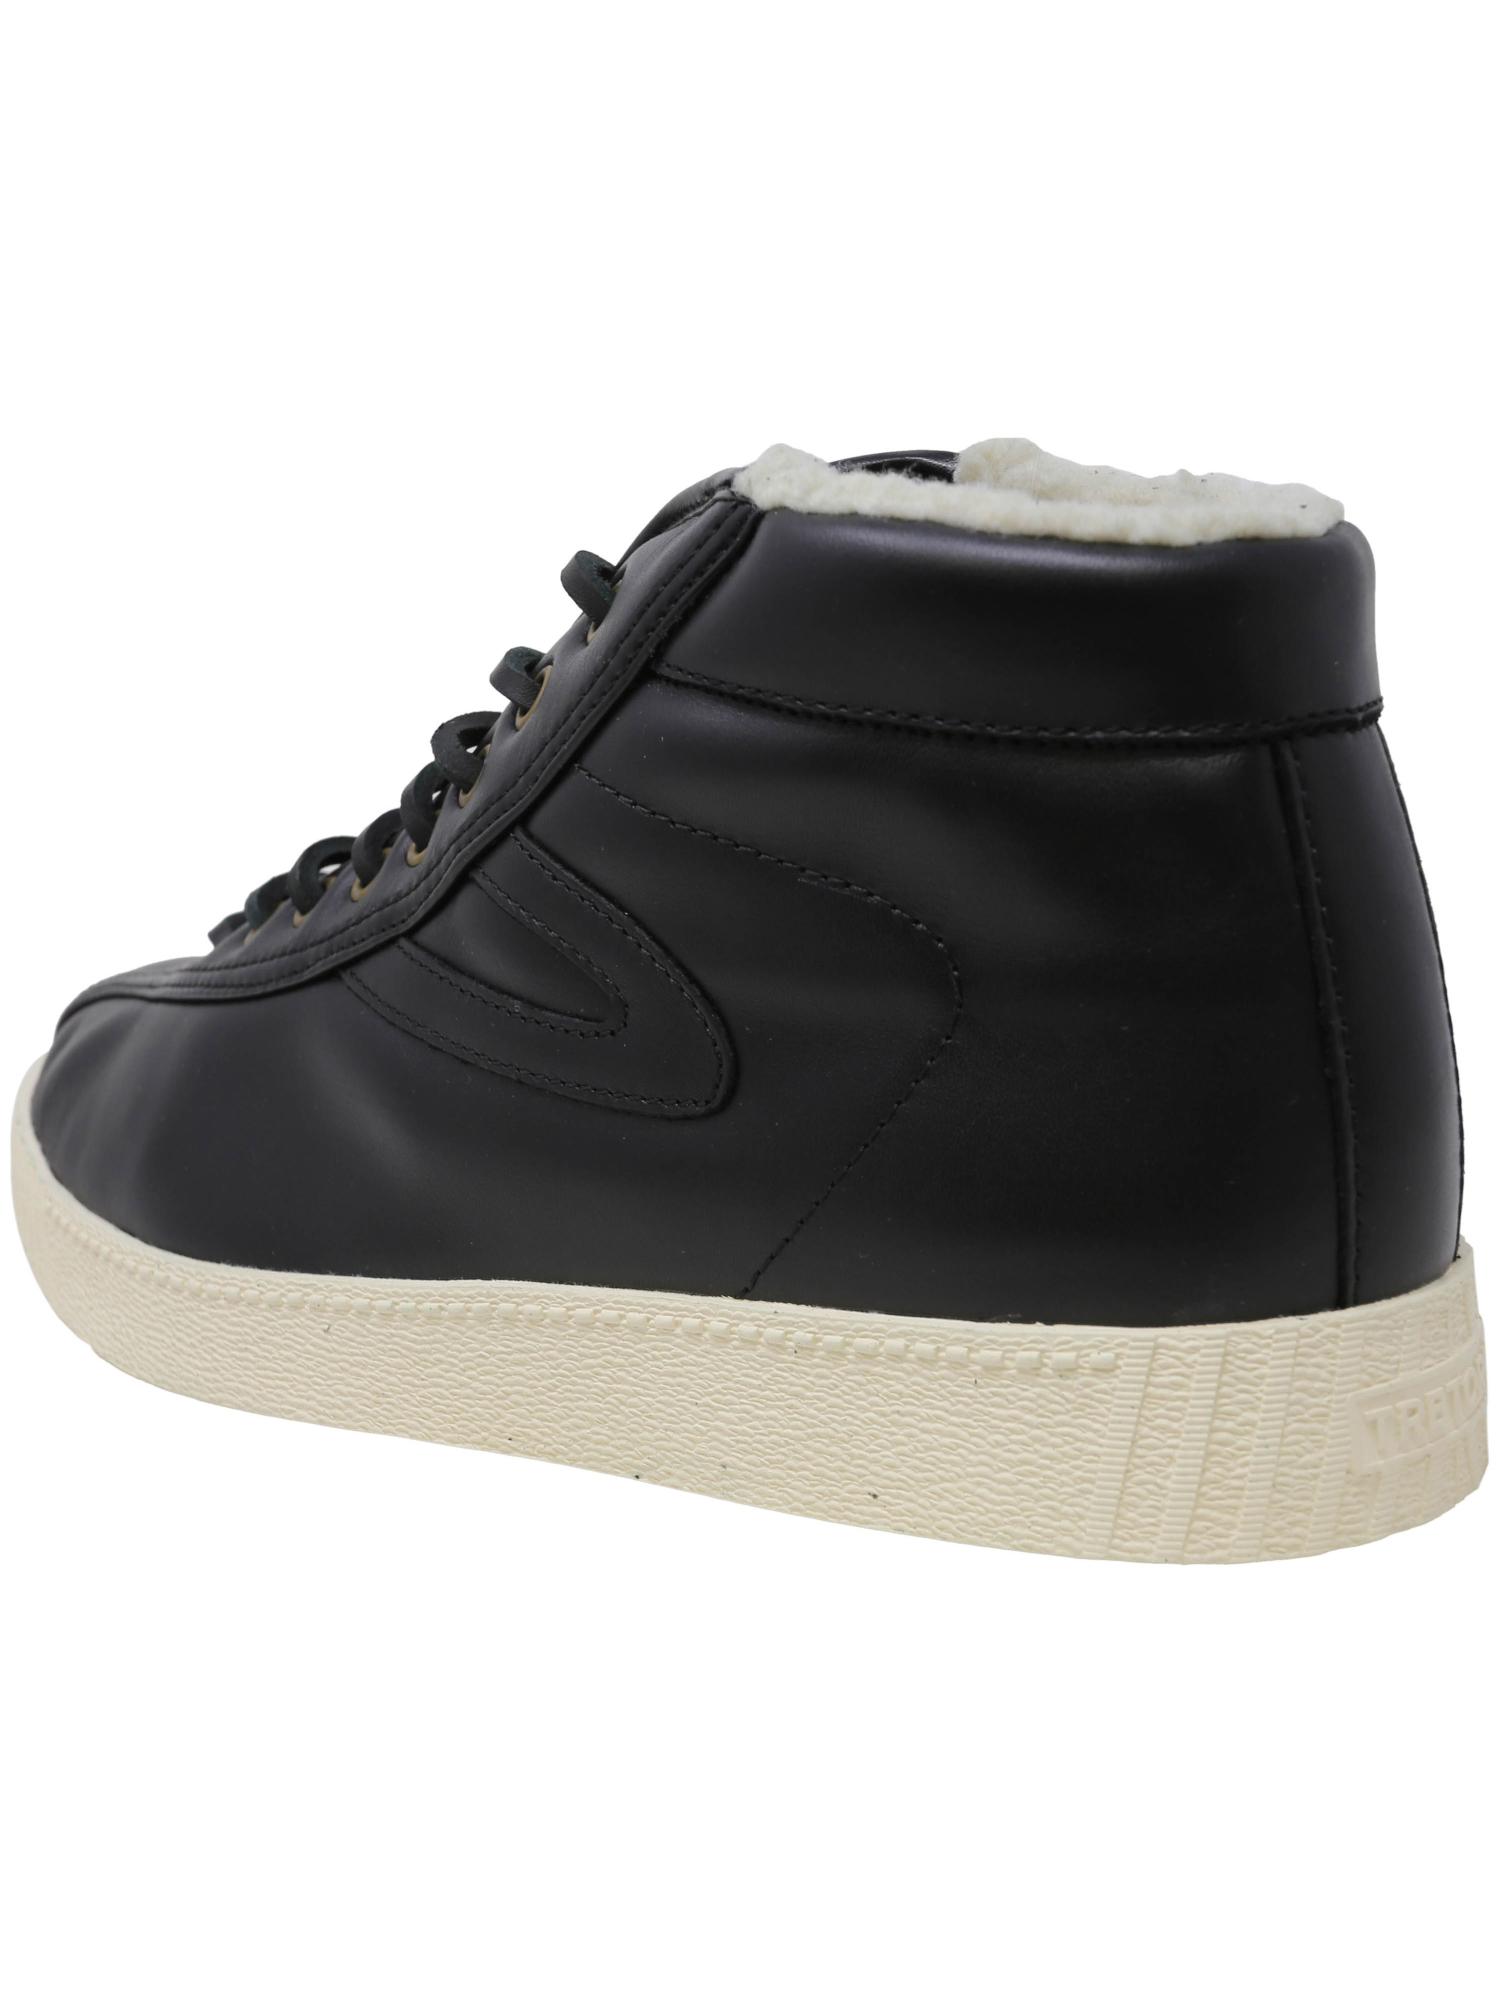 Tretorn Men's Nylite Hi 2 Leather Mid Top Fashion Sneaker